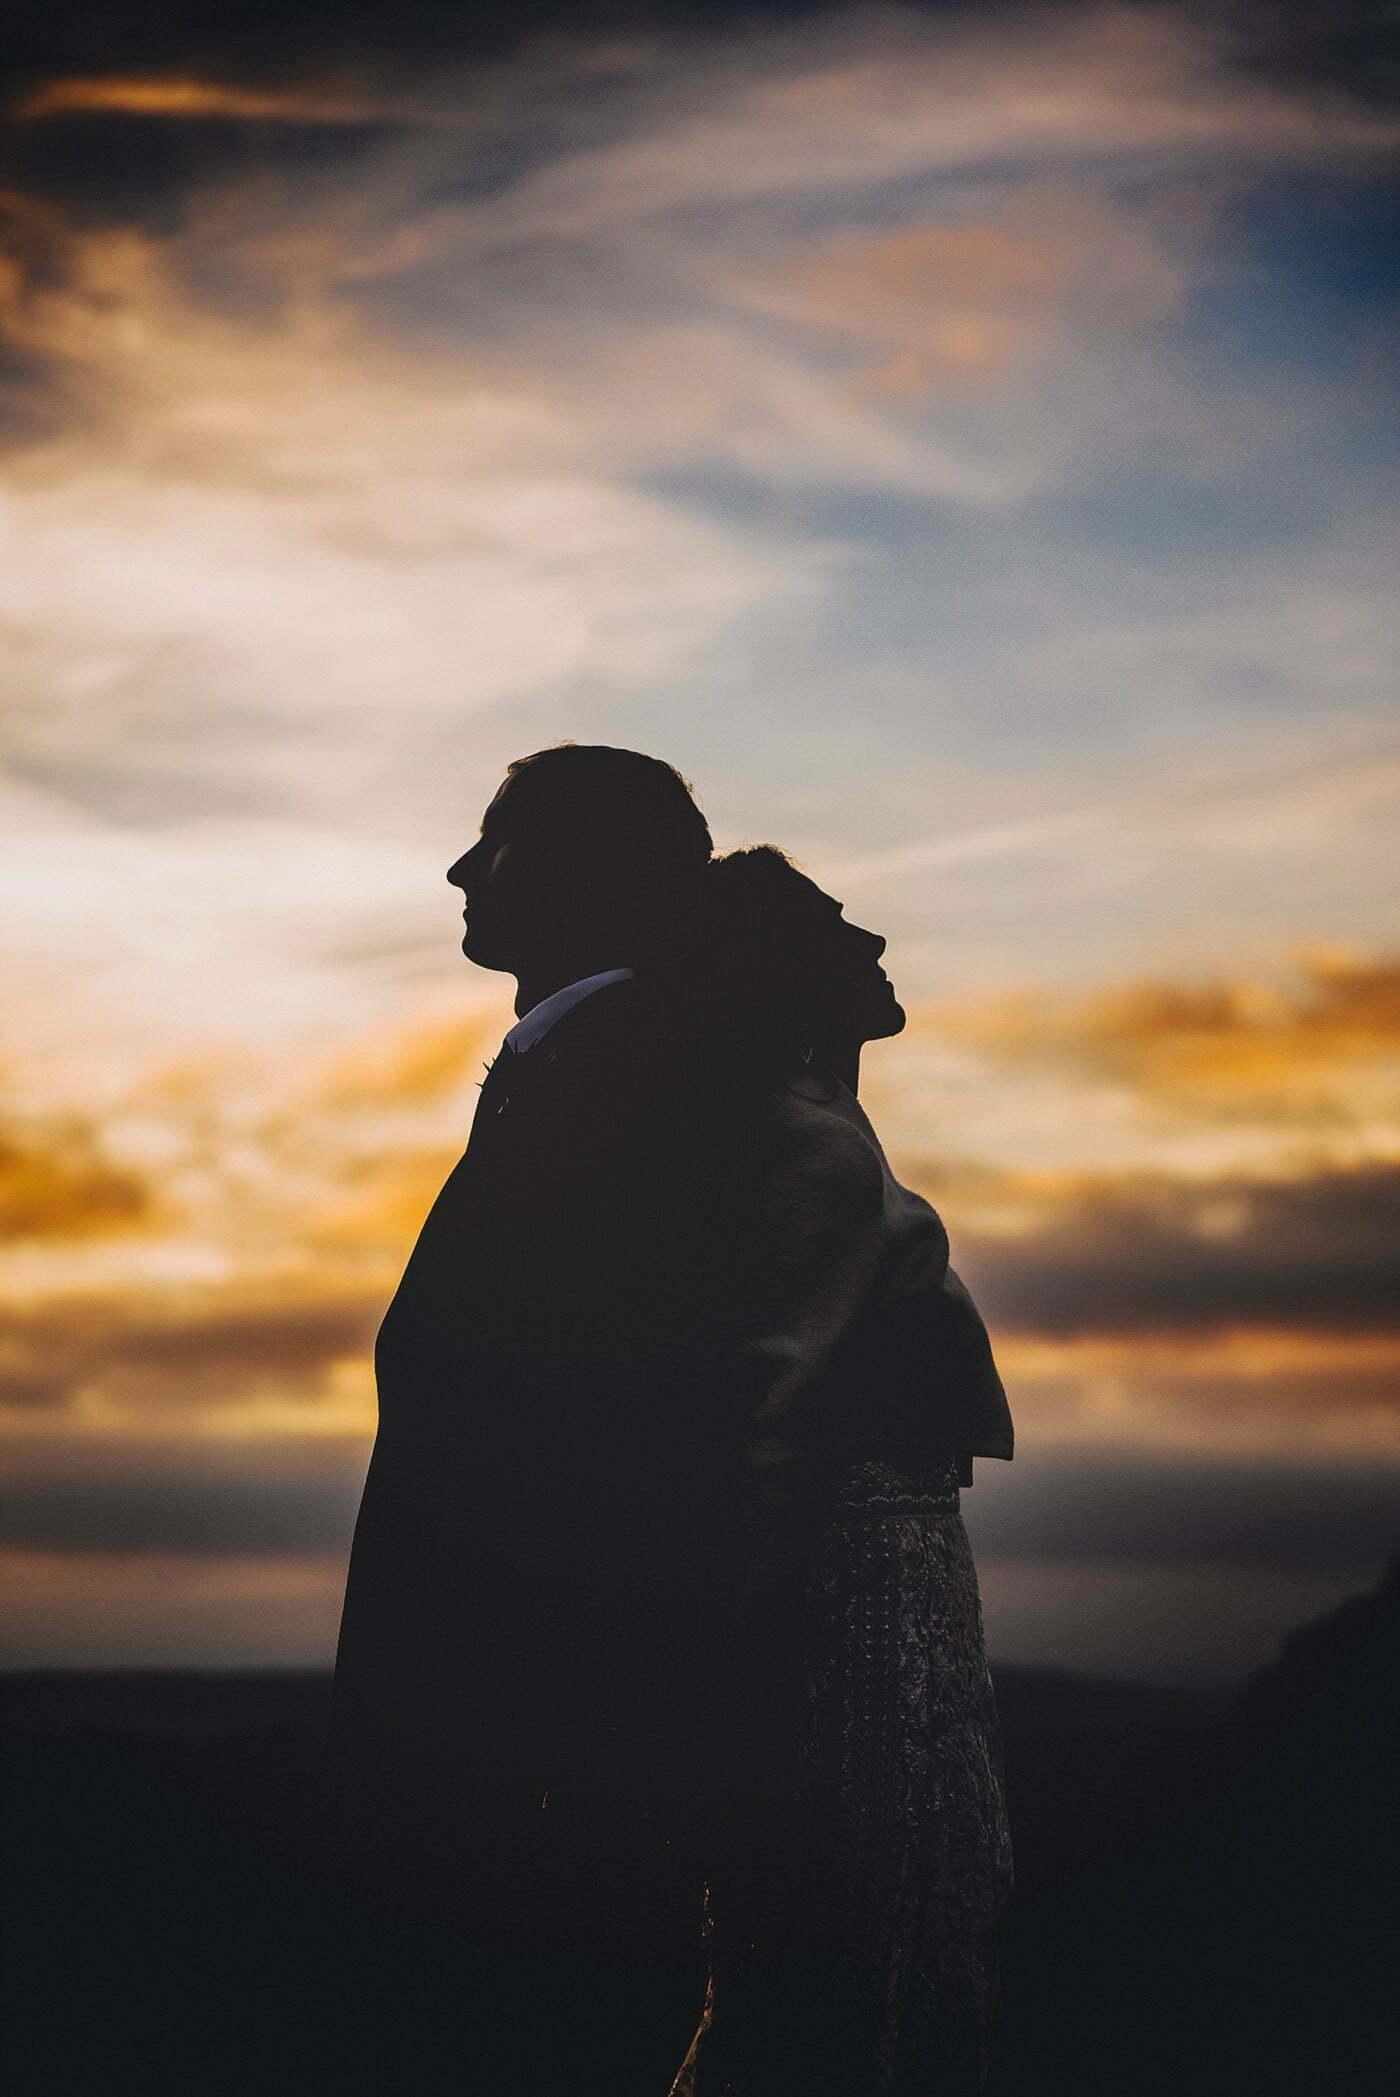 dewsall court couple sunset